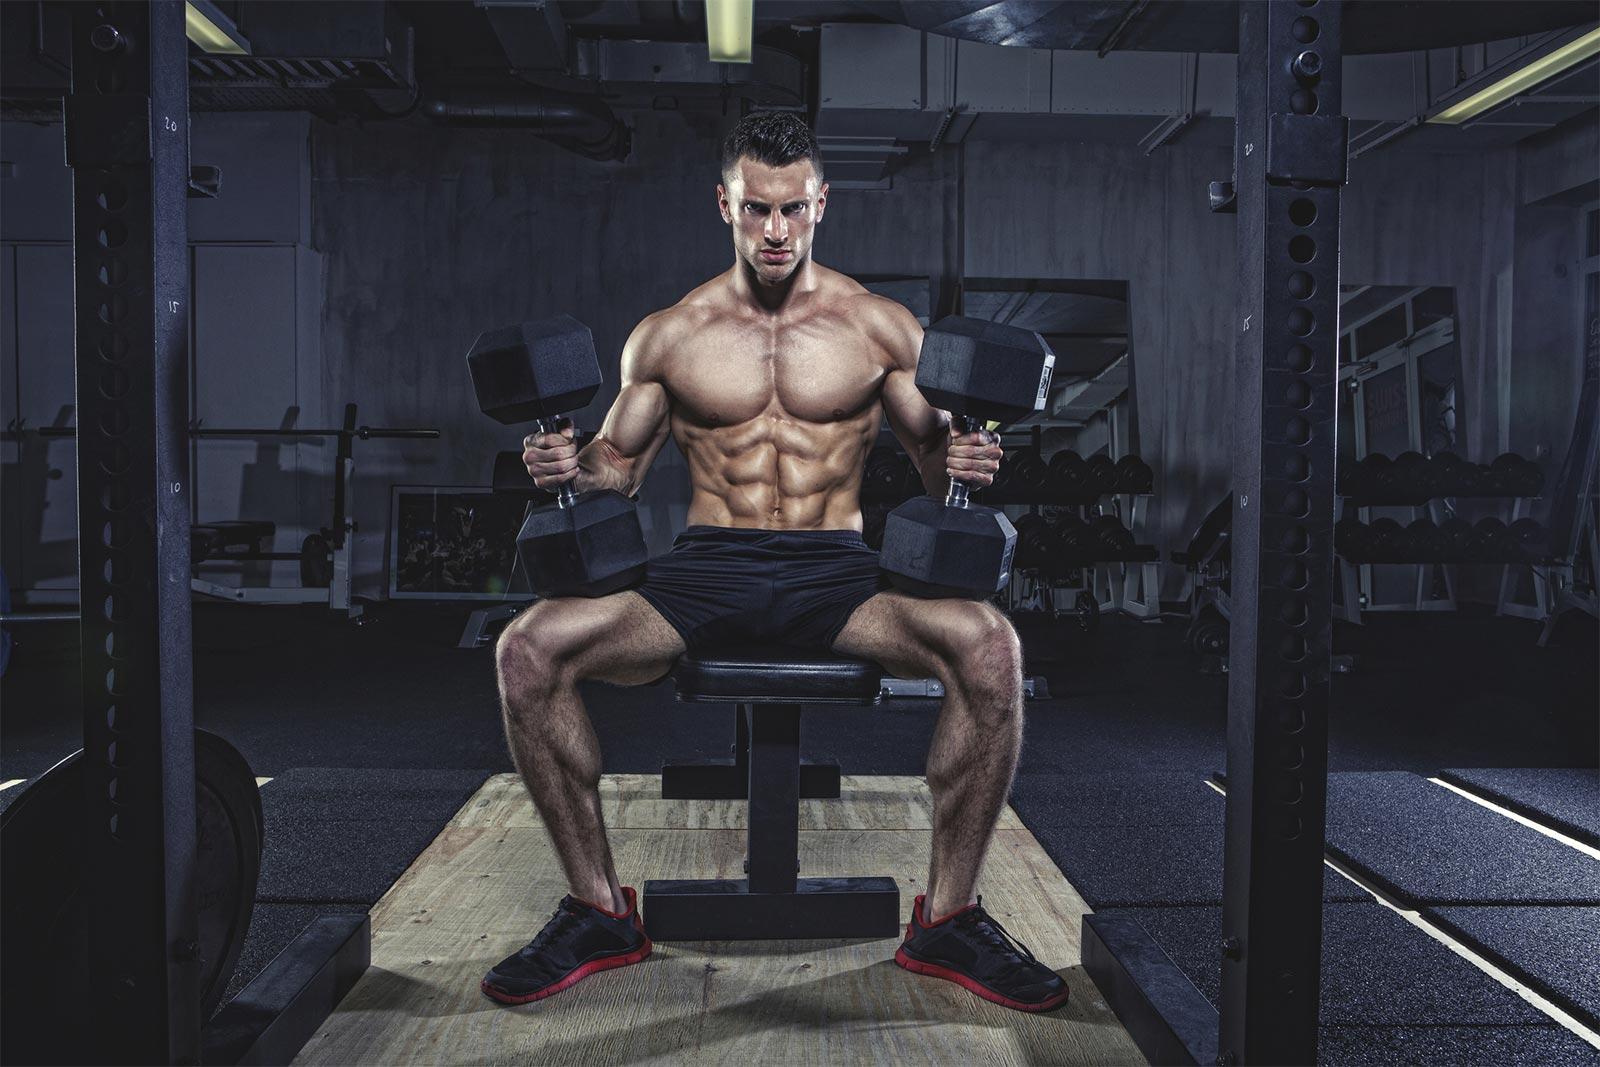 homme haut volume entrainement musculation force